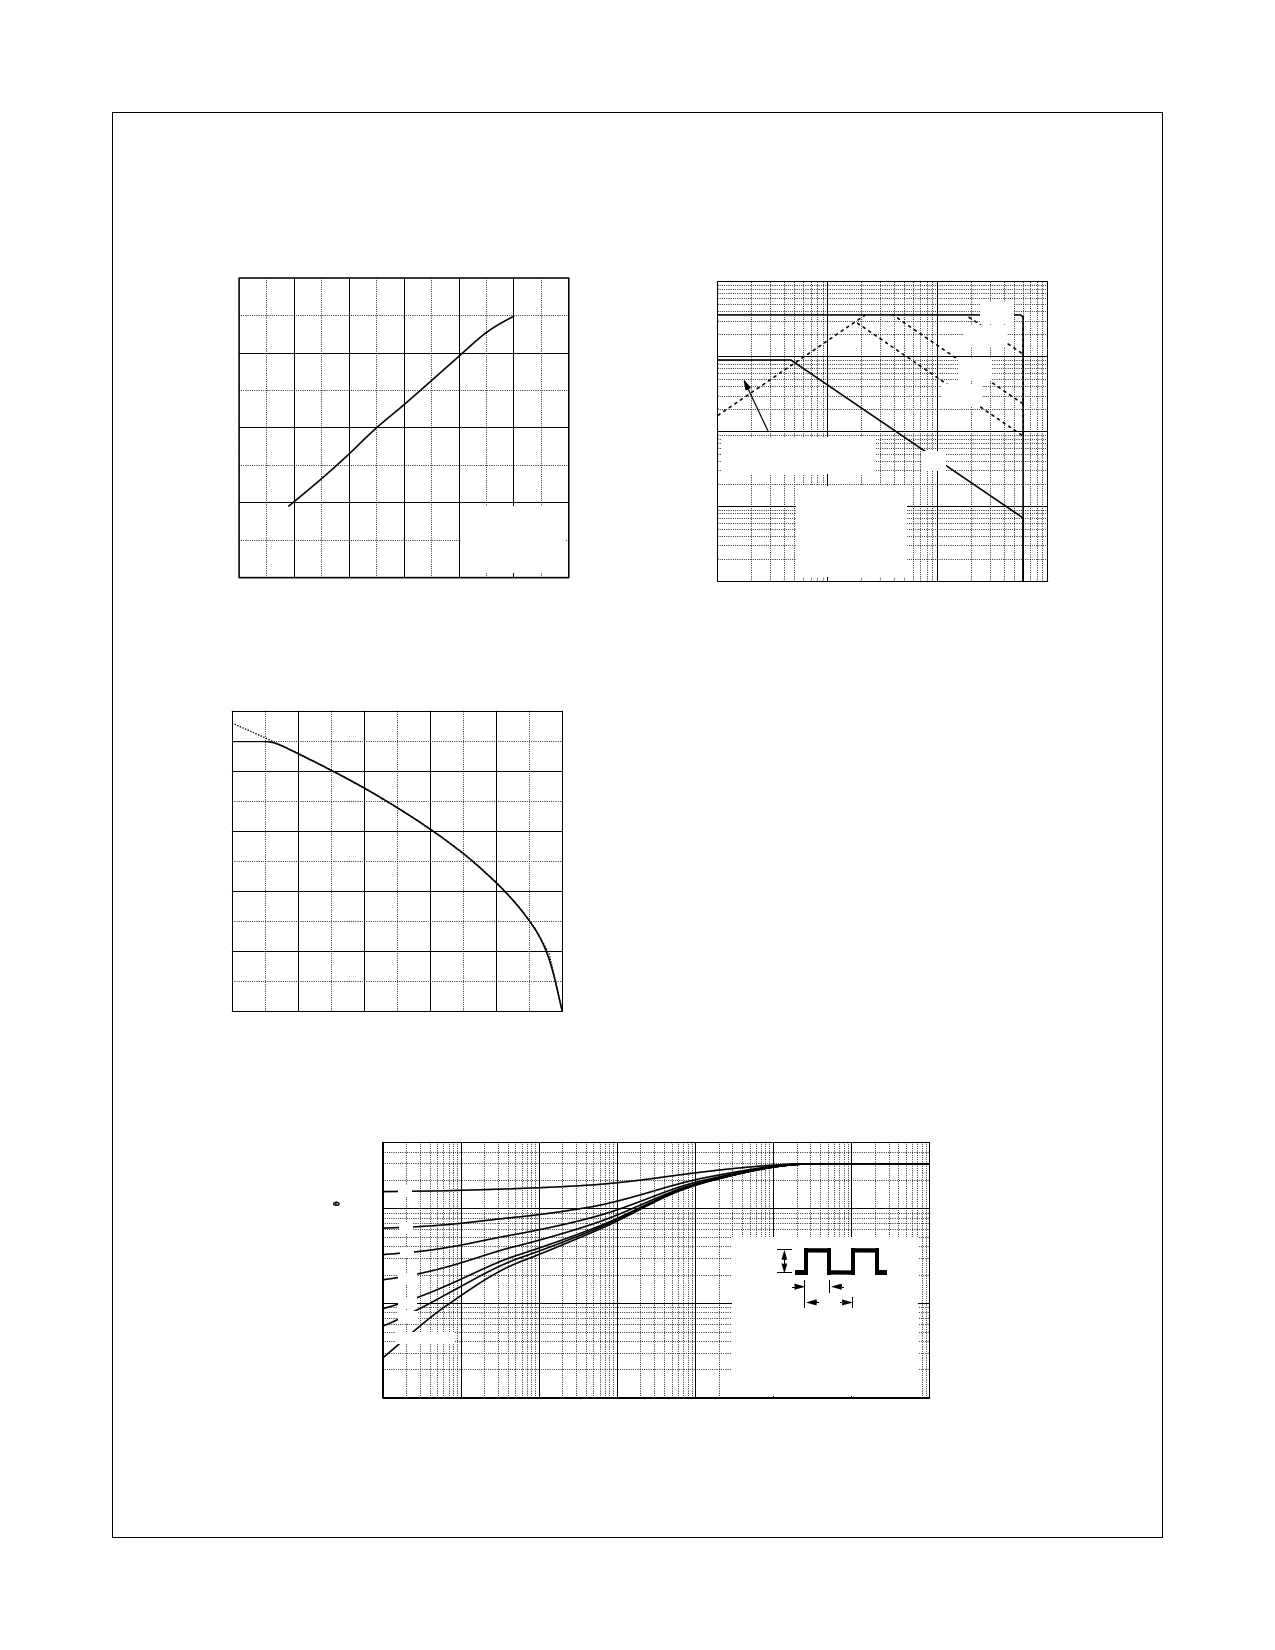 FDP10N60ZU pdf, 반도체, 판매, 대치품